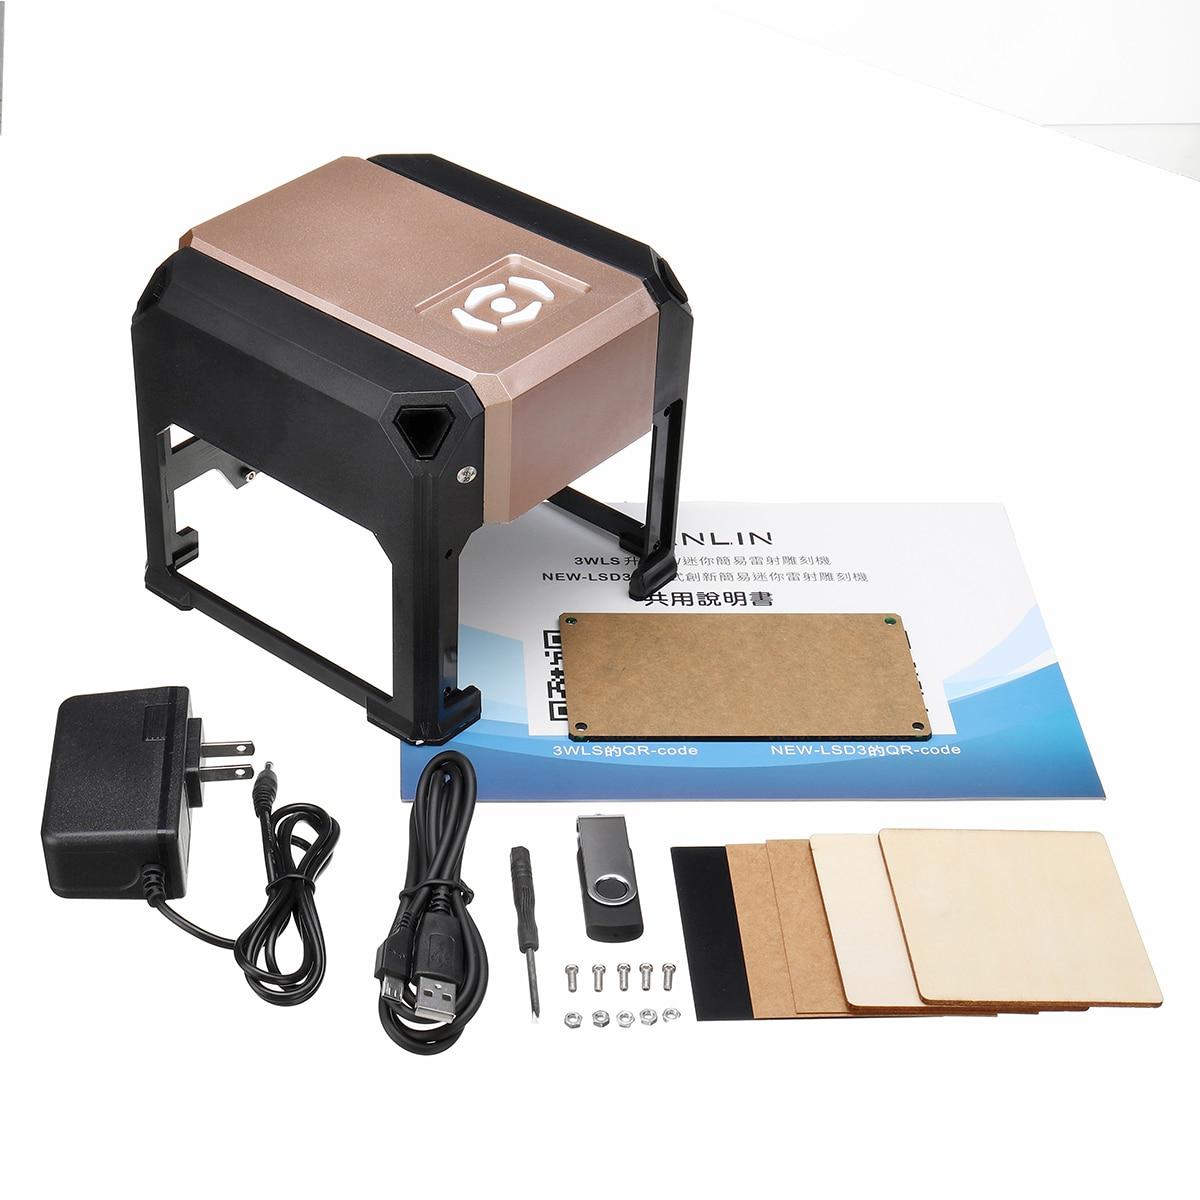 bluetooth Control 3000mW Professional DIY Desktop Mini CNC Laser Engraver Cutter Engraving Wood Cutting Machine Router 110 220V - 2